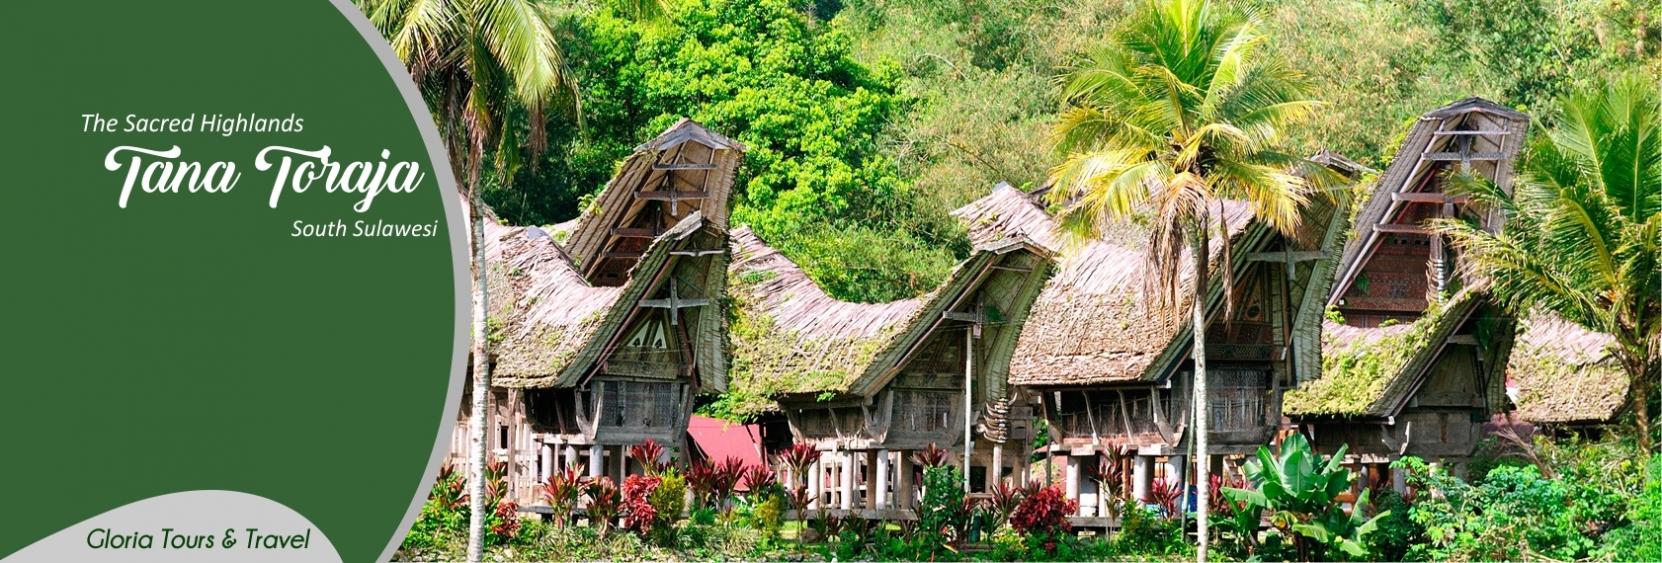 Tana Toraja South Sulawesi